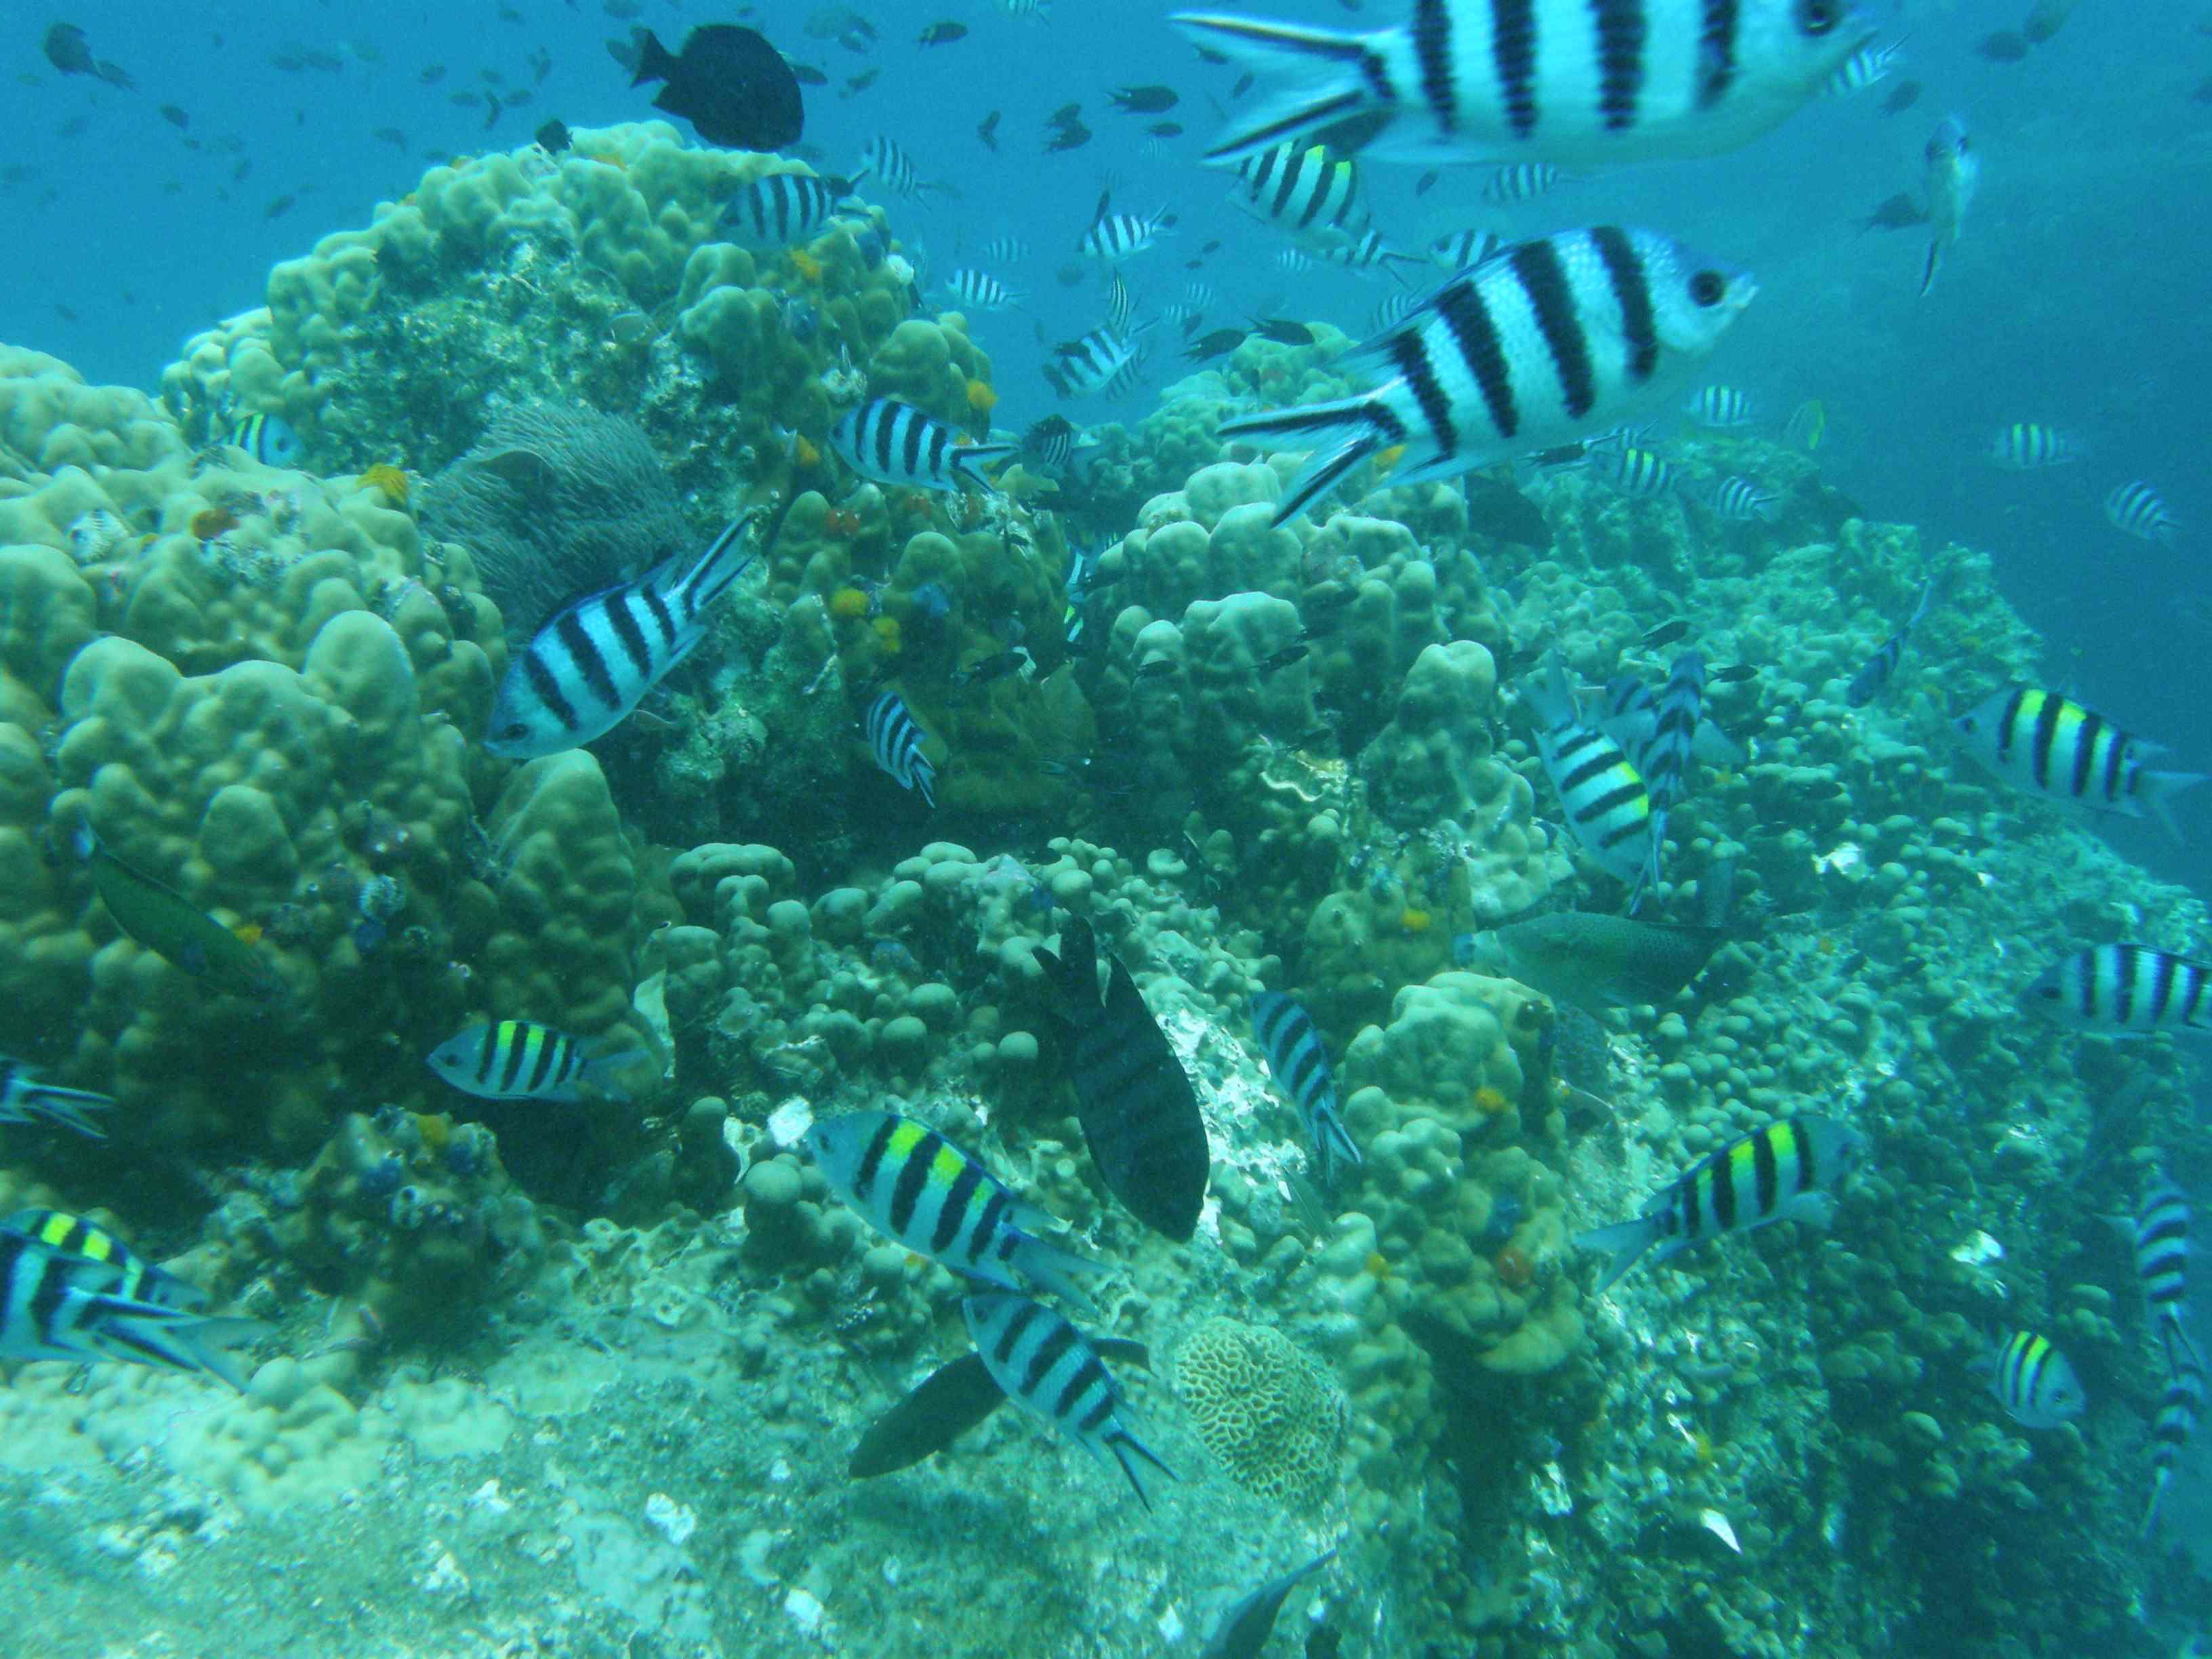 Kalkafzetting koralen neemt af